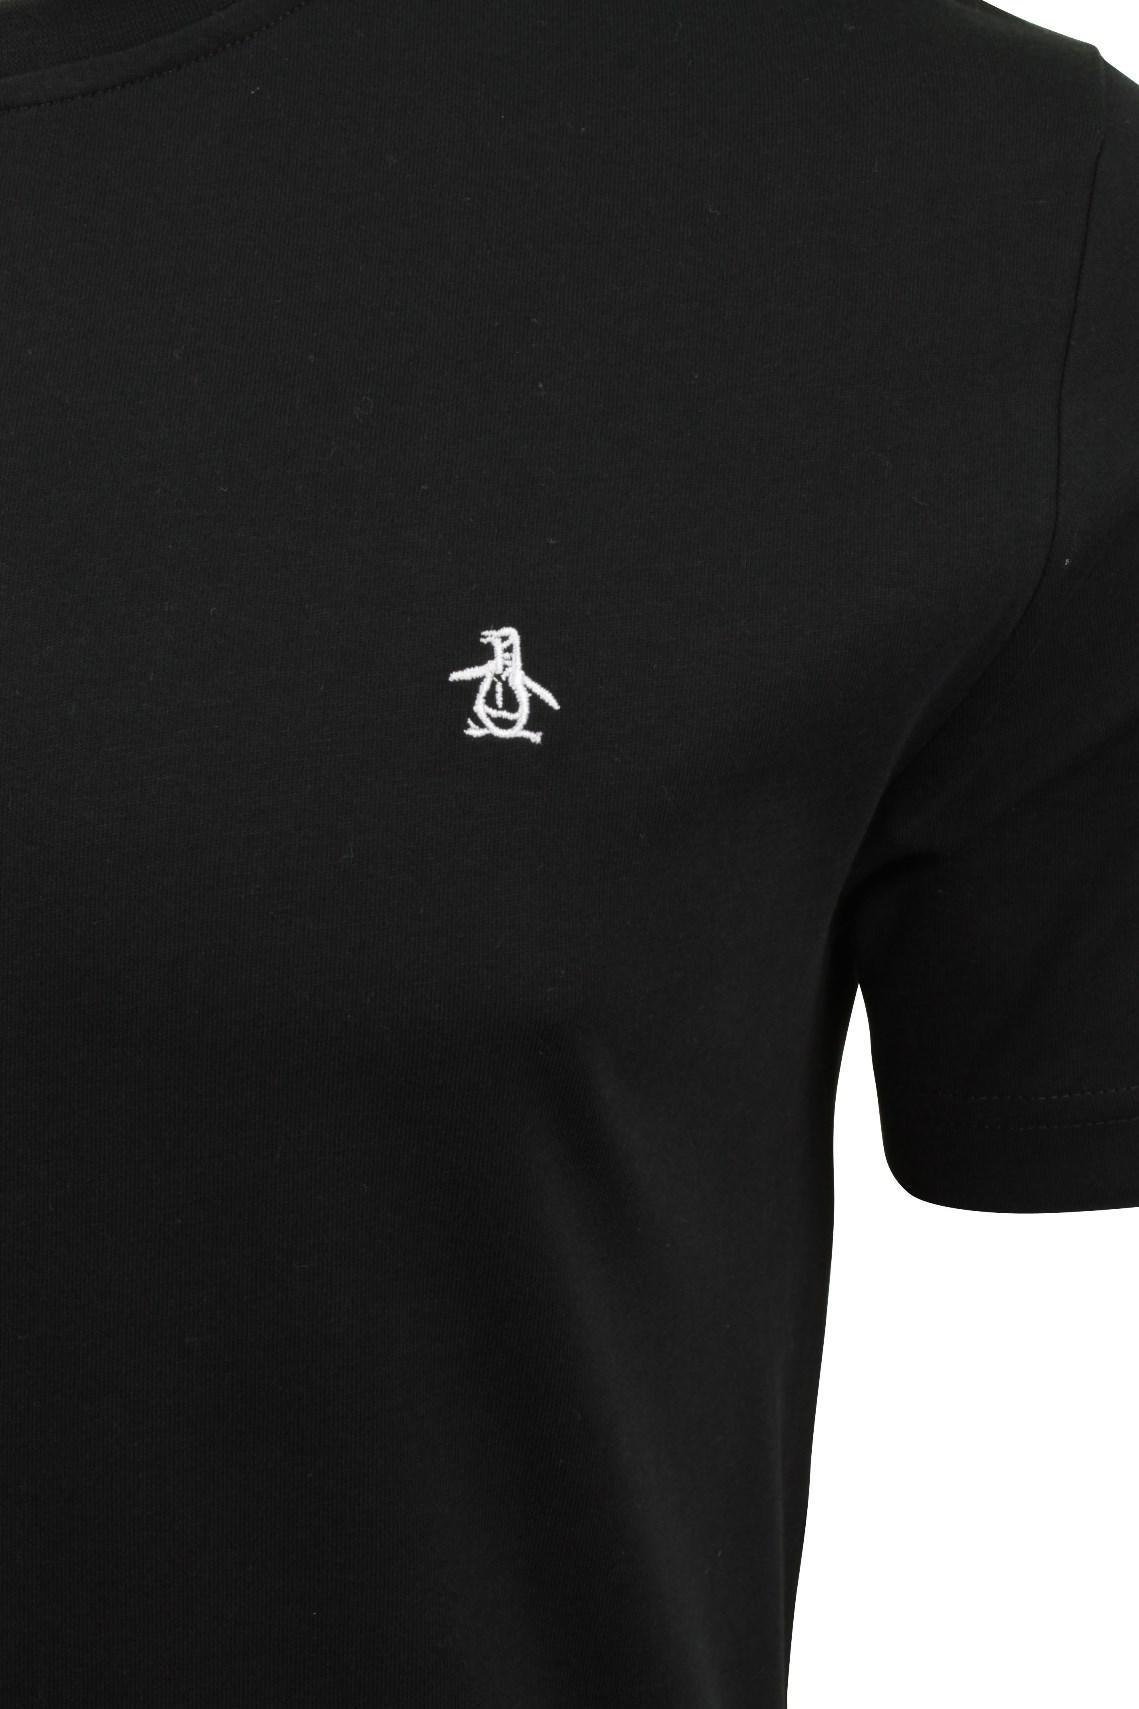 Mens-T-Shirt-by-Original-Penguin-Crew-Neck-Short-Sleeved thumbnail 52